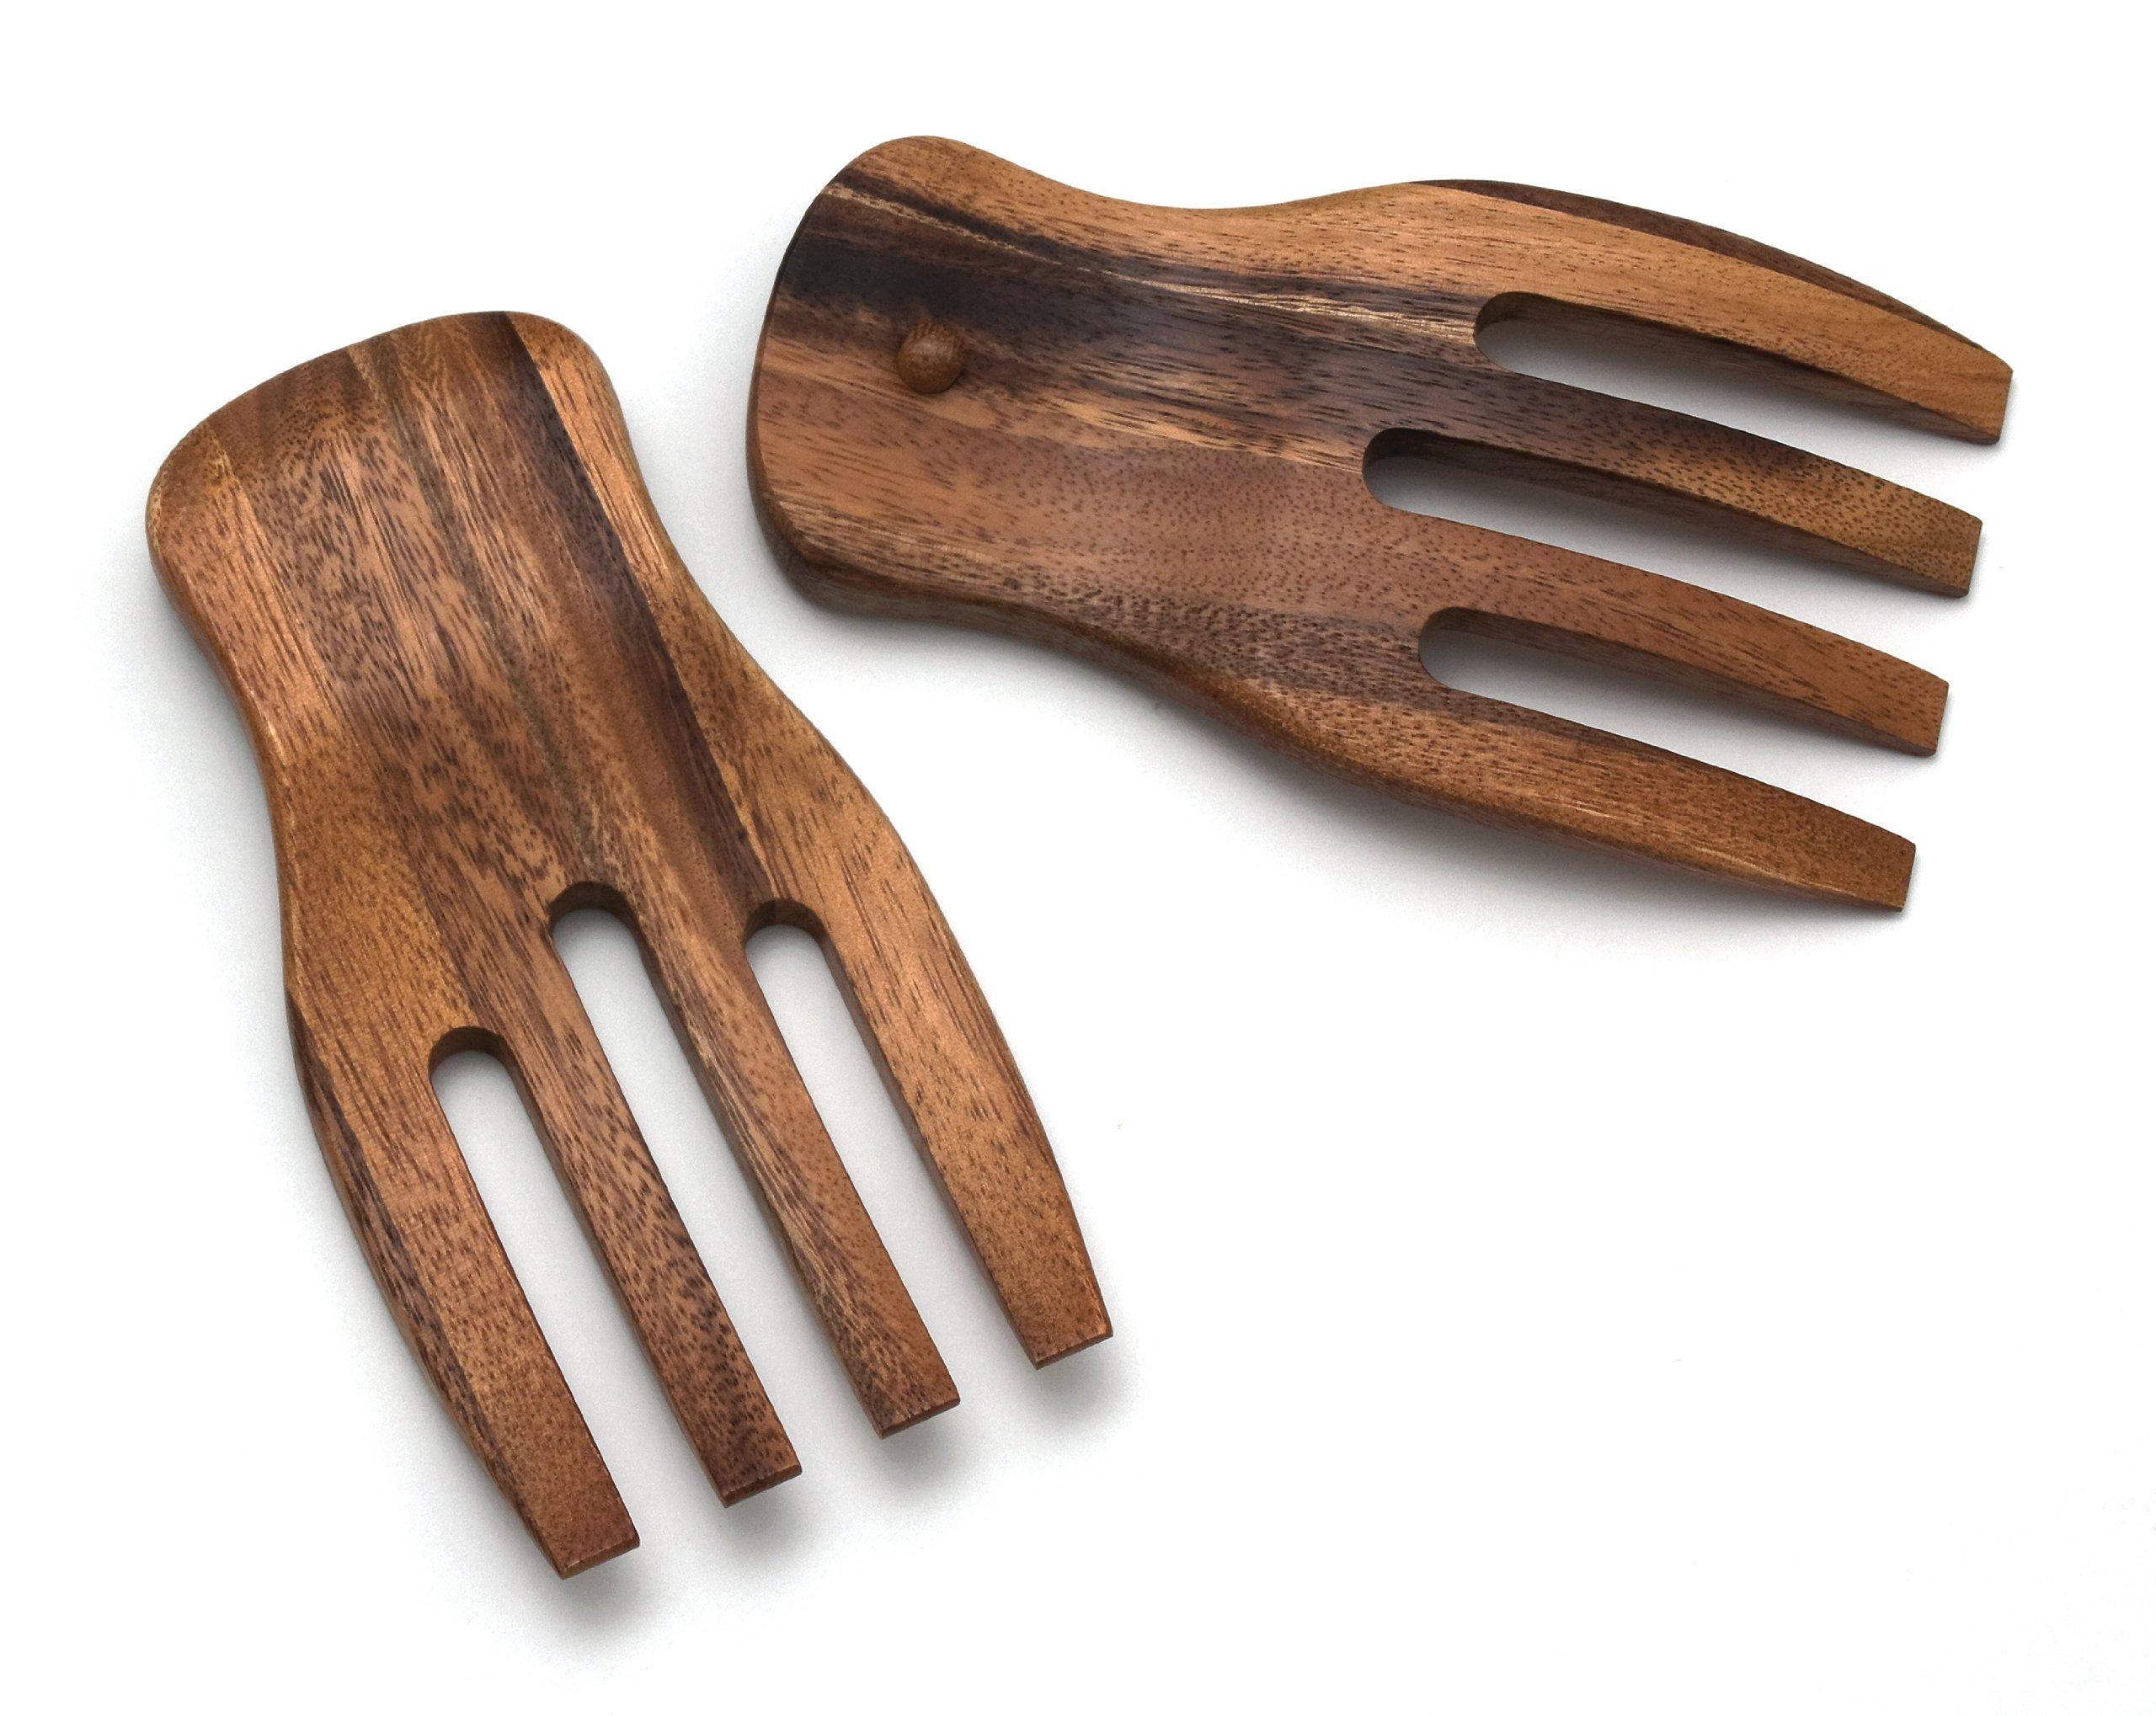 Lipper International 1102 Acacia Salad Hands, 3.75'' x 7'' x 1.88'', One Pair by Lipper International